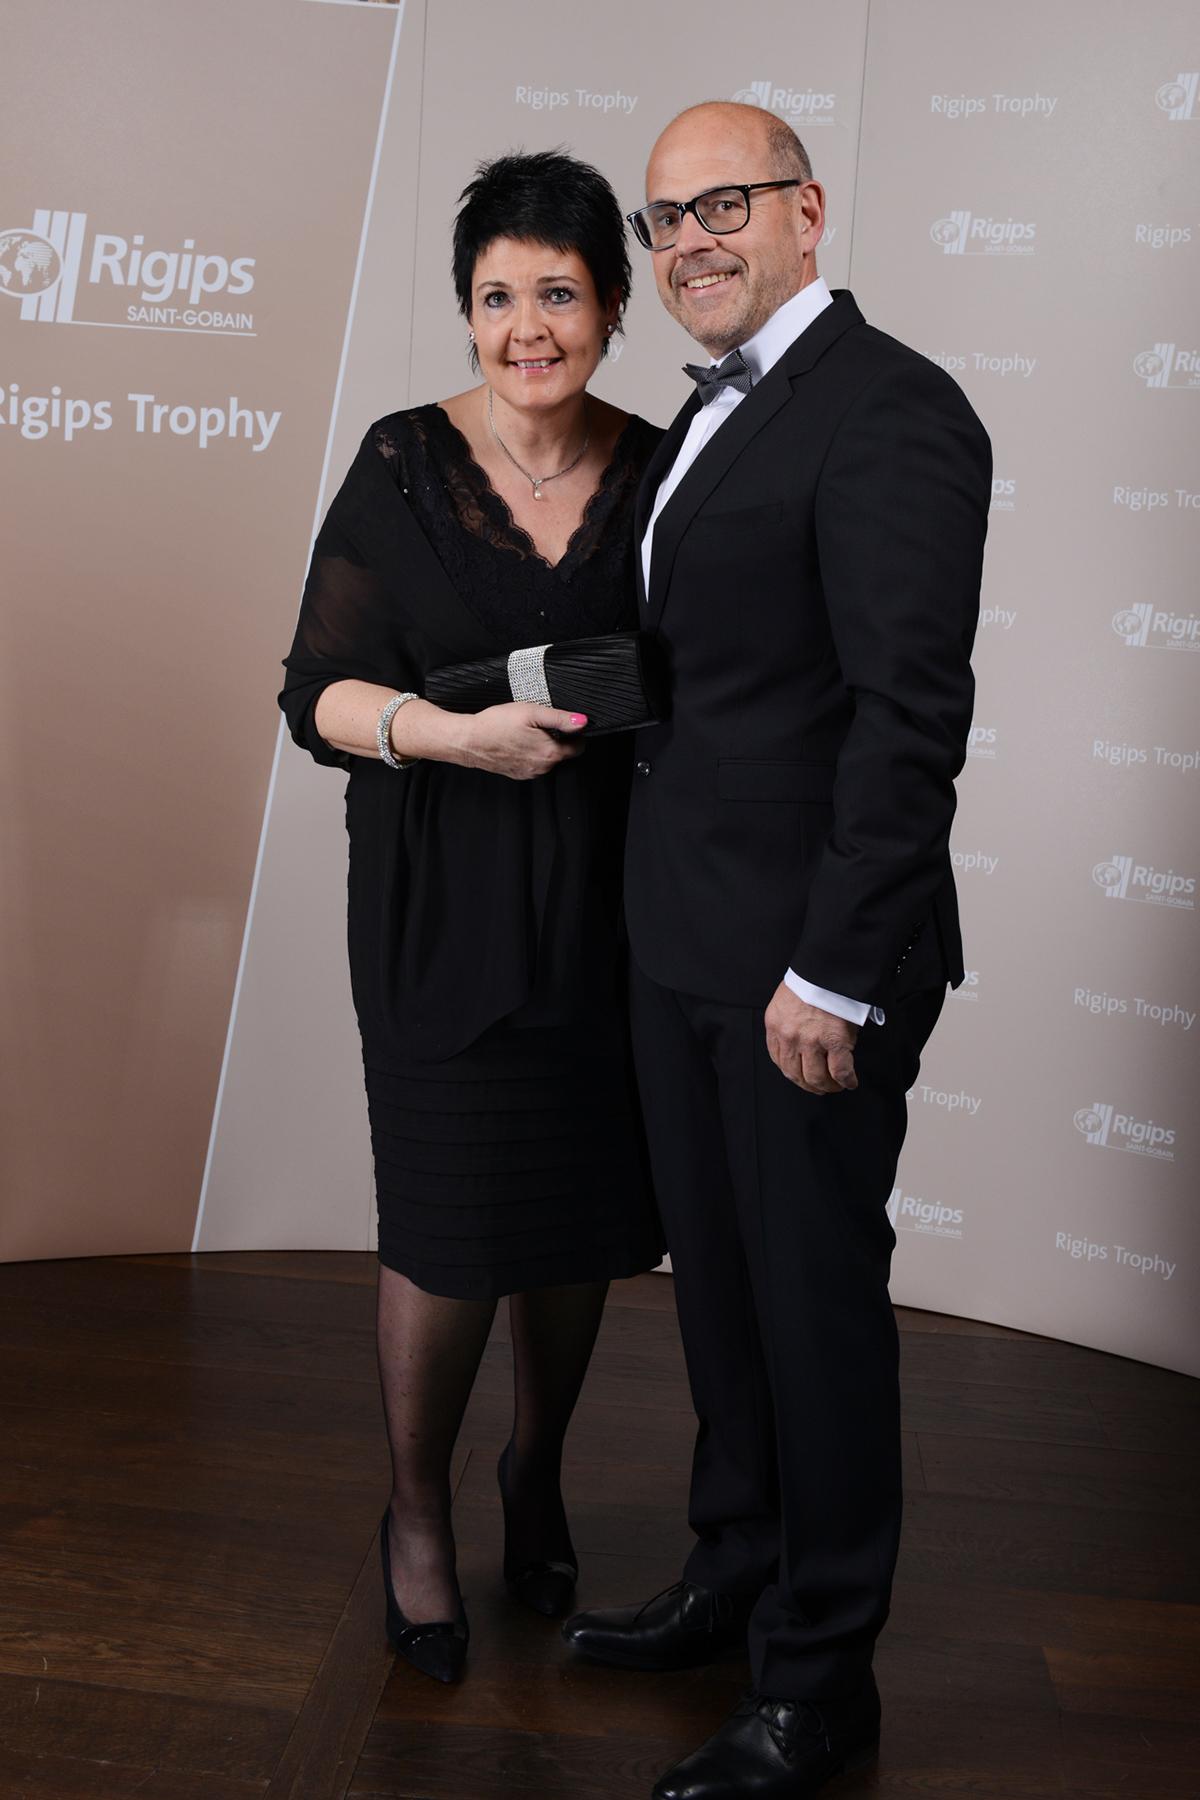 Rigips Trophy 16_0220